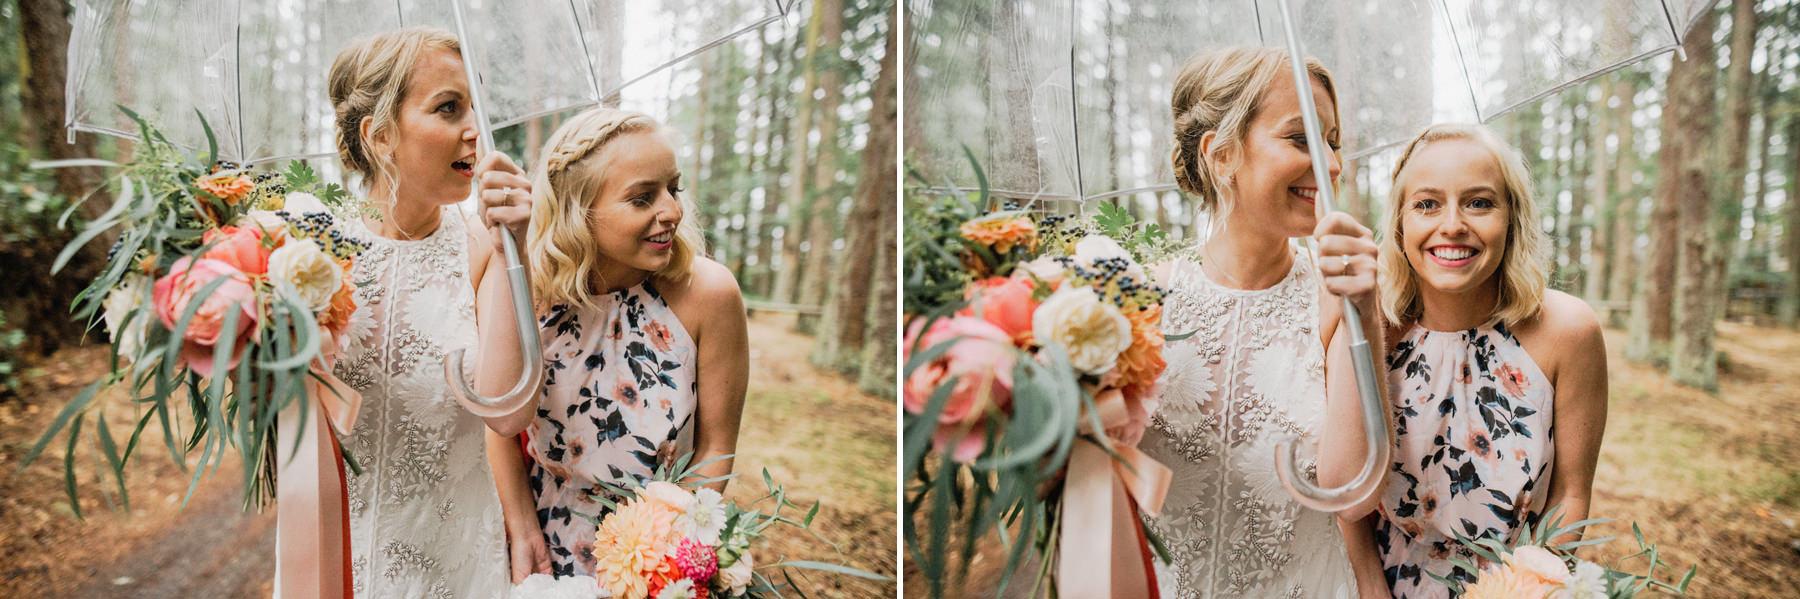 298-colorful-outdoor-lopez-island-wedding.jpg